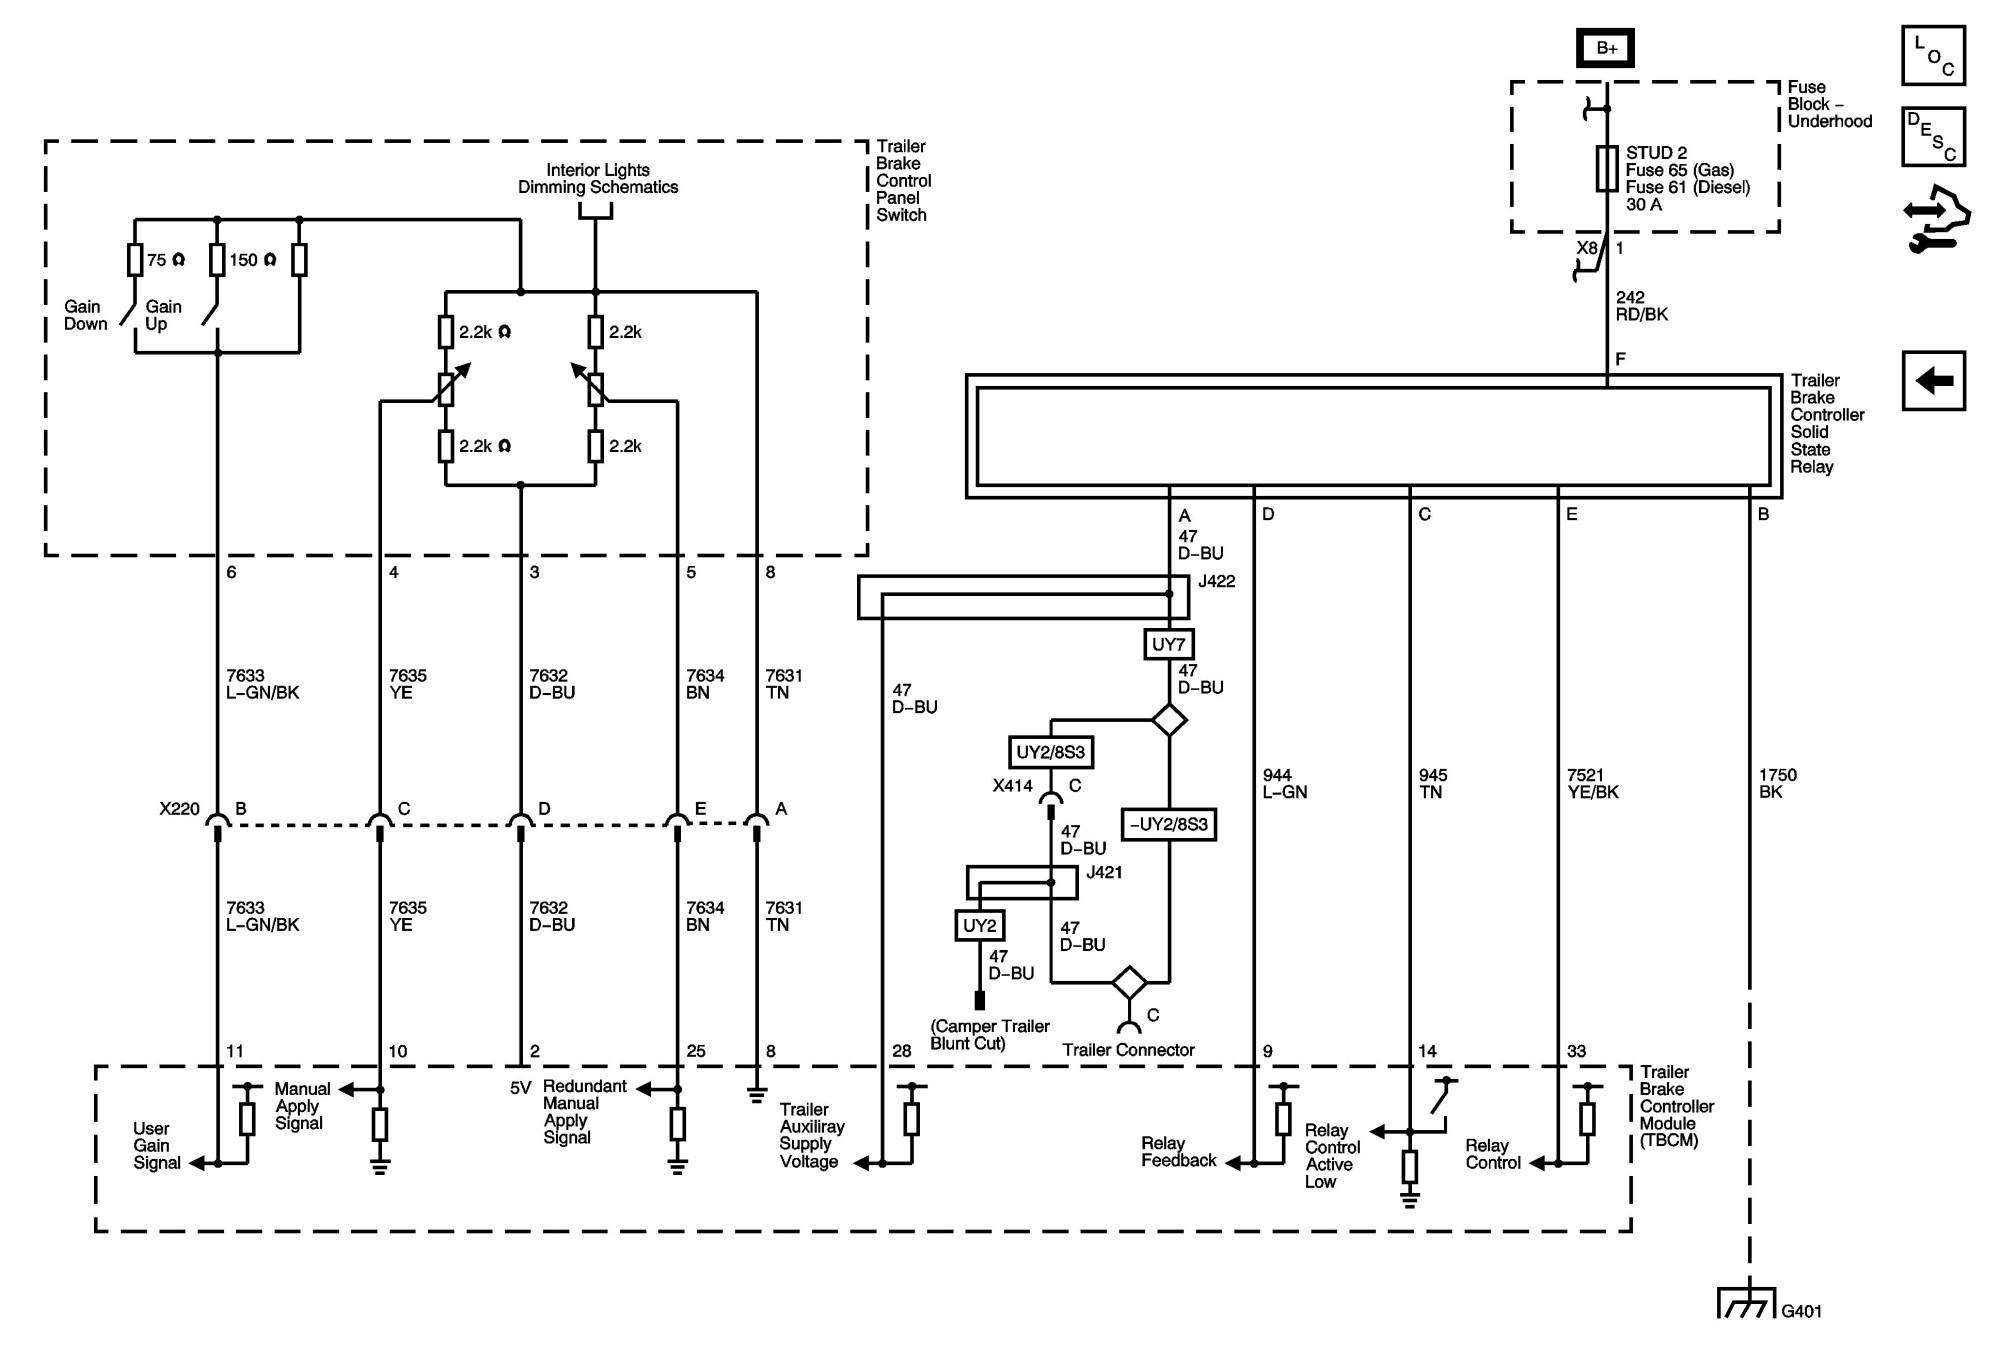 hight resolution of tekonsha wiring diagram 1 wiring diagram sourcetekonsha voyager wiring diagram ford f 450 schematic diagram datatekonsha